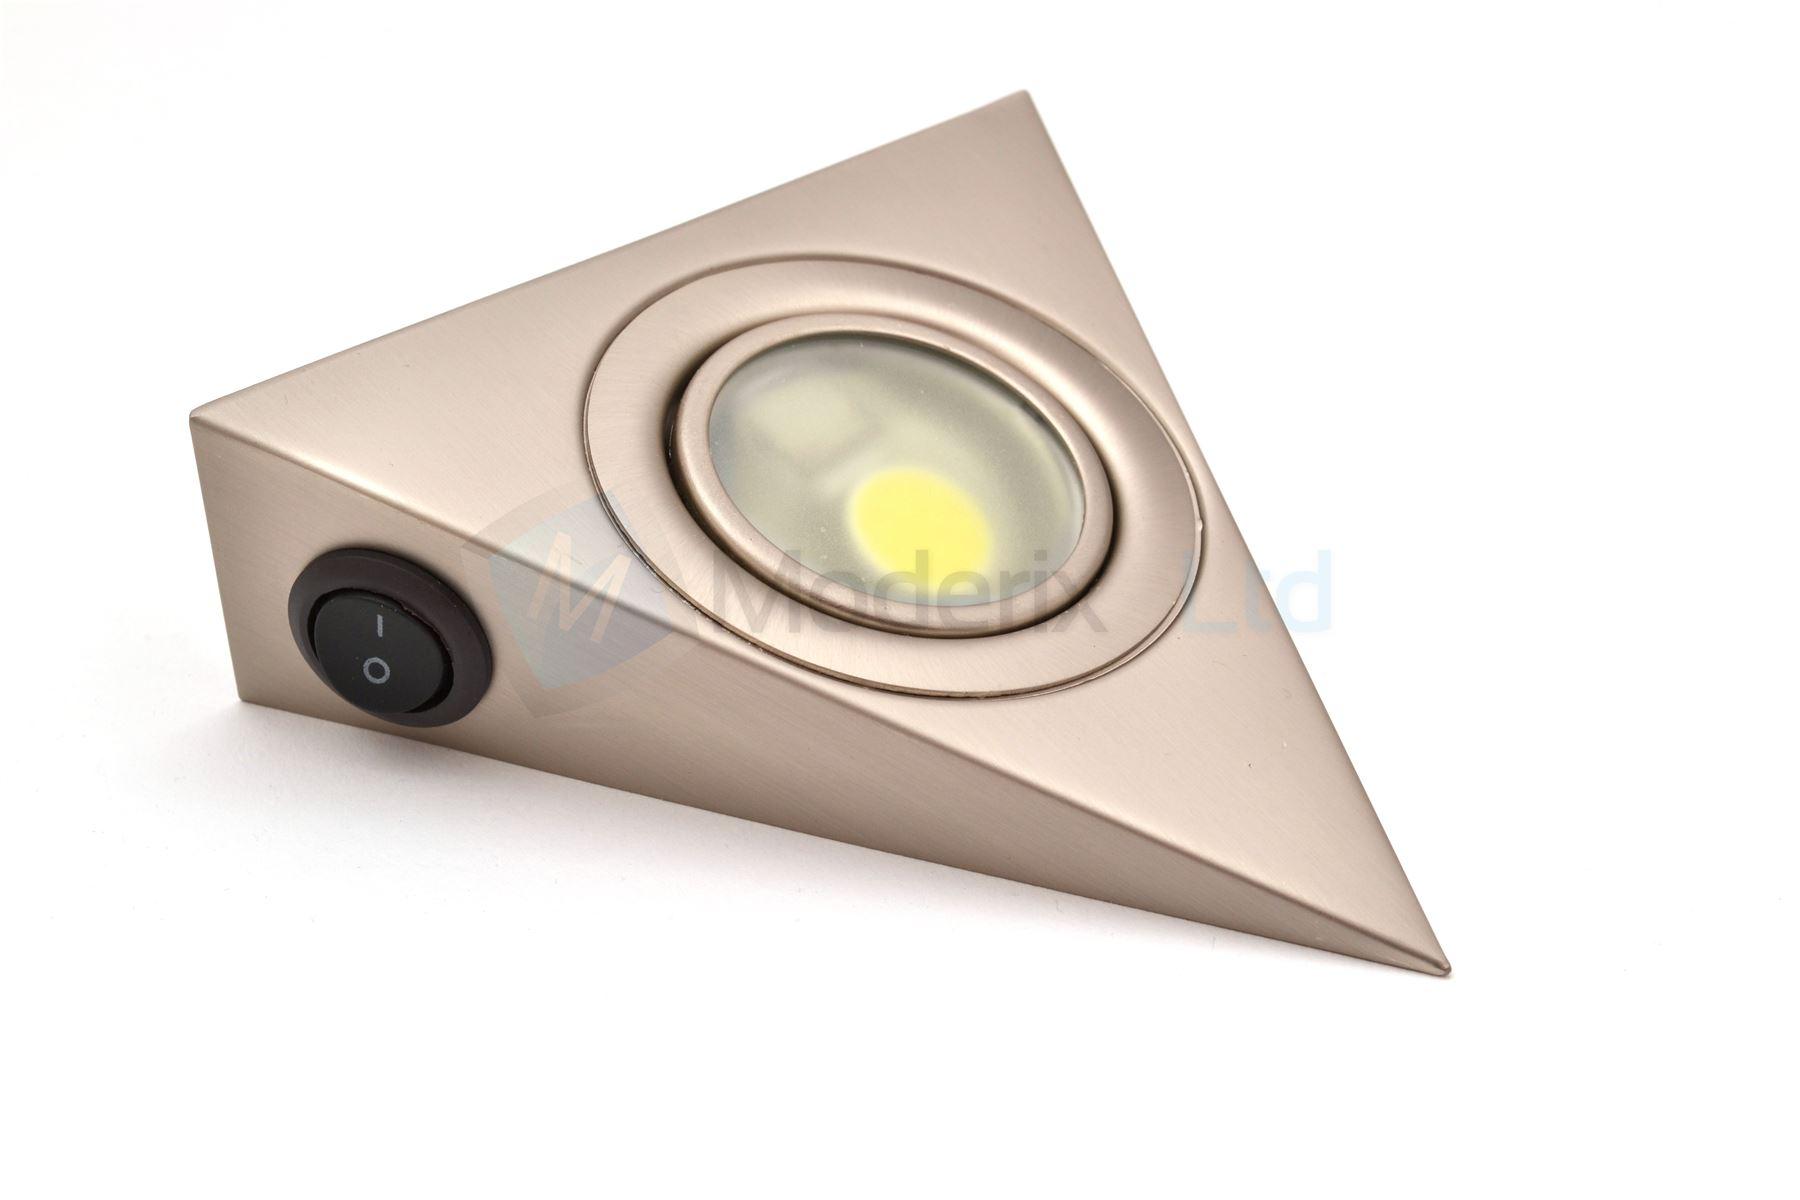 led triangle with switch satin kitchen under cabinet light set kit gtv ebay. Black Bedroom Furniture Sets. Home Design Ideas